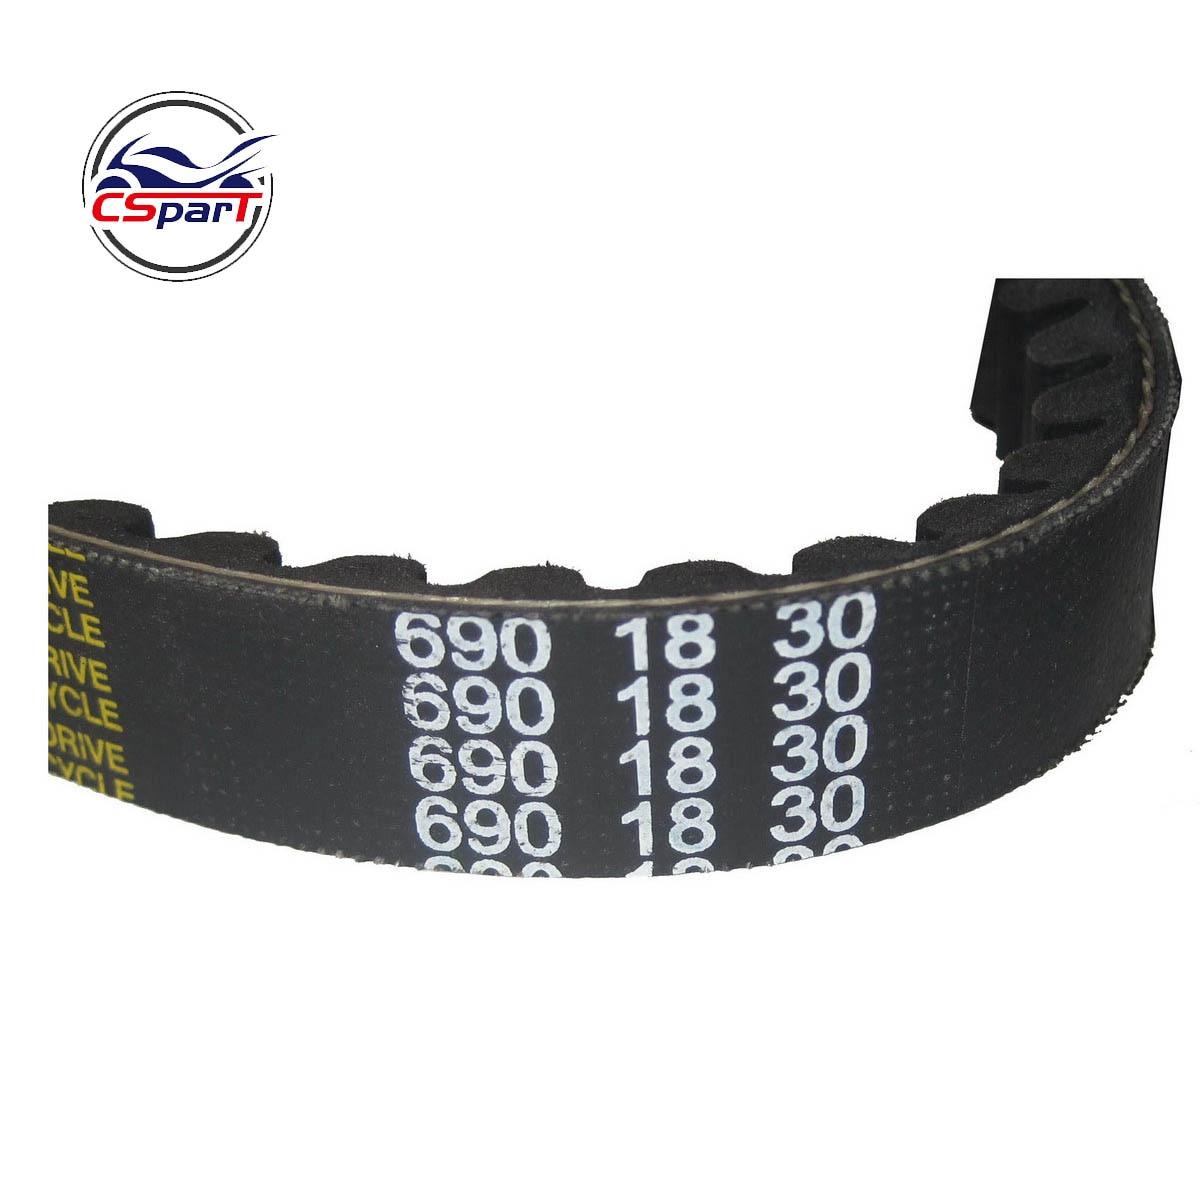 GY6 CVT Drive Belt 49CC 50CC 139QMB Scooter Jonway Baotian 723 17.5 28